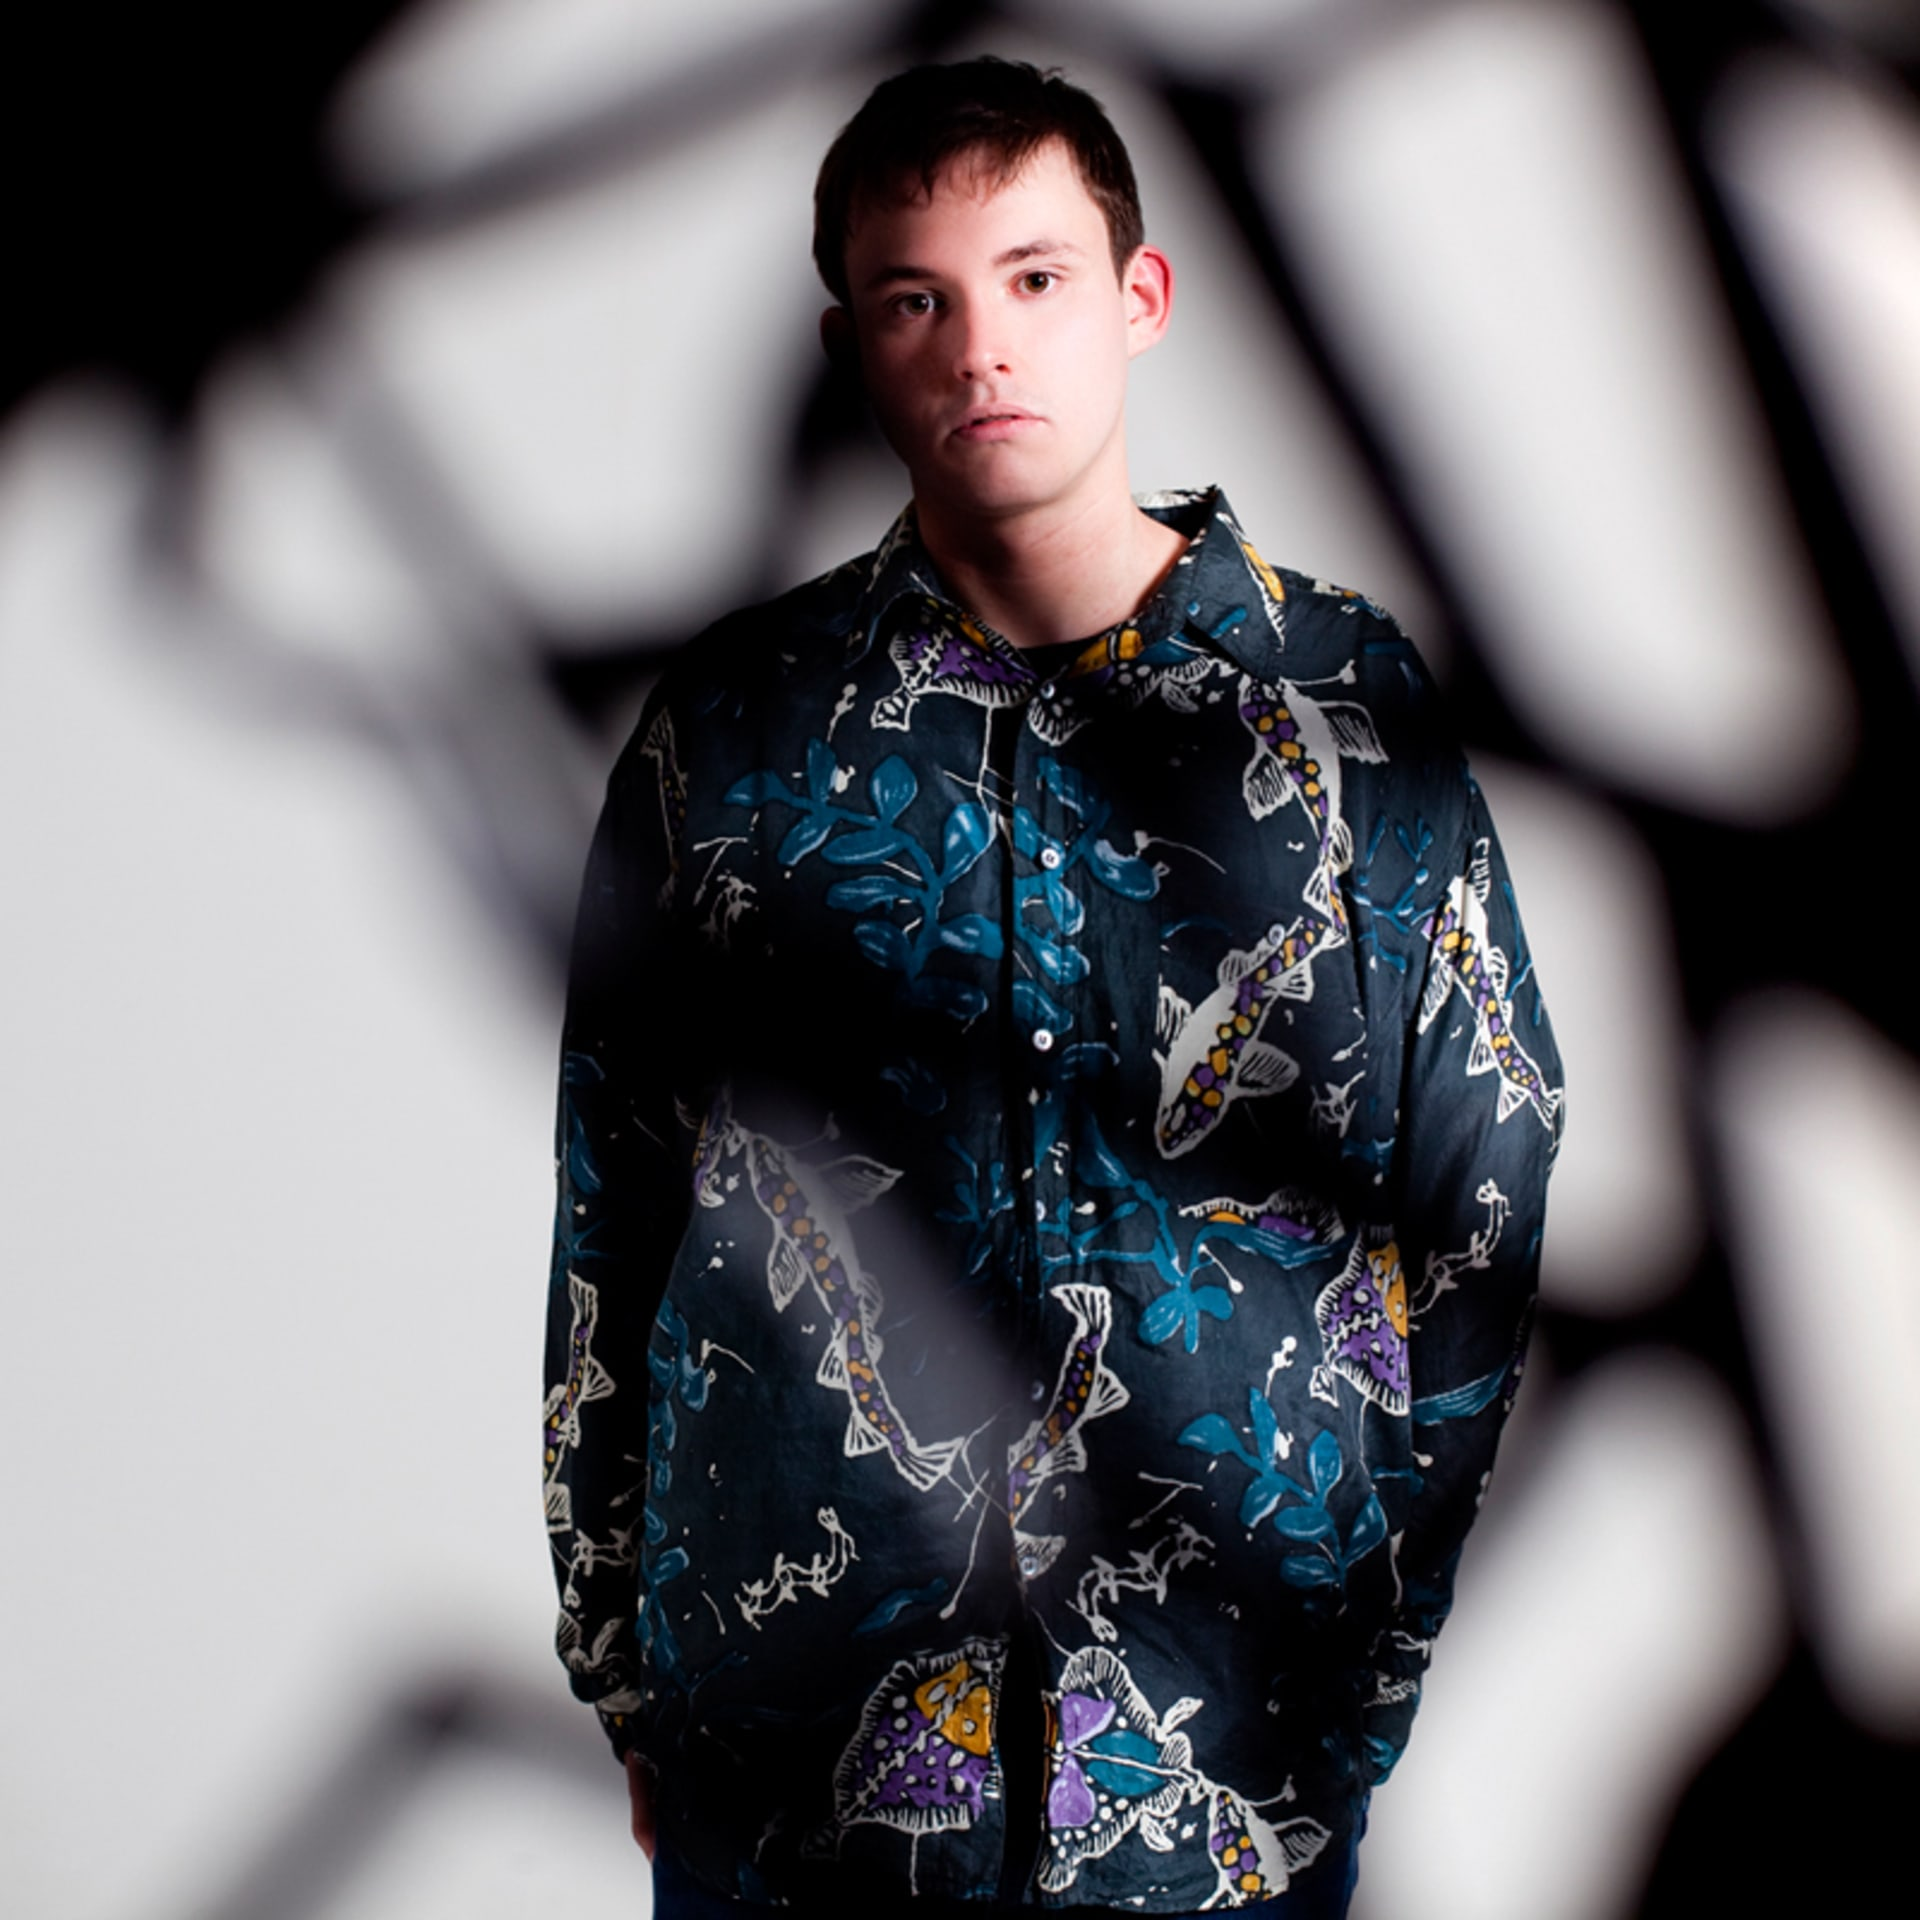 Hudson Mohawke Electronic Beats Interview